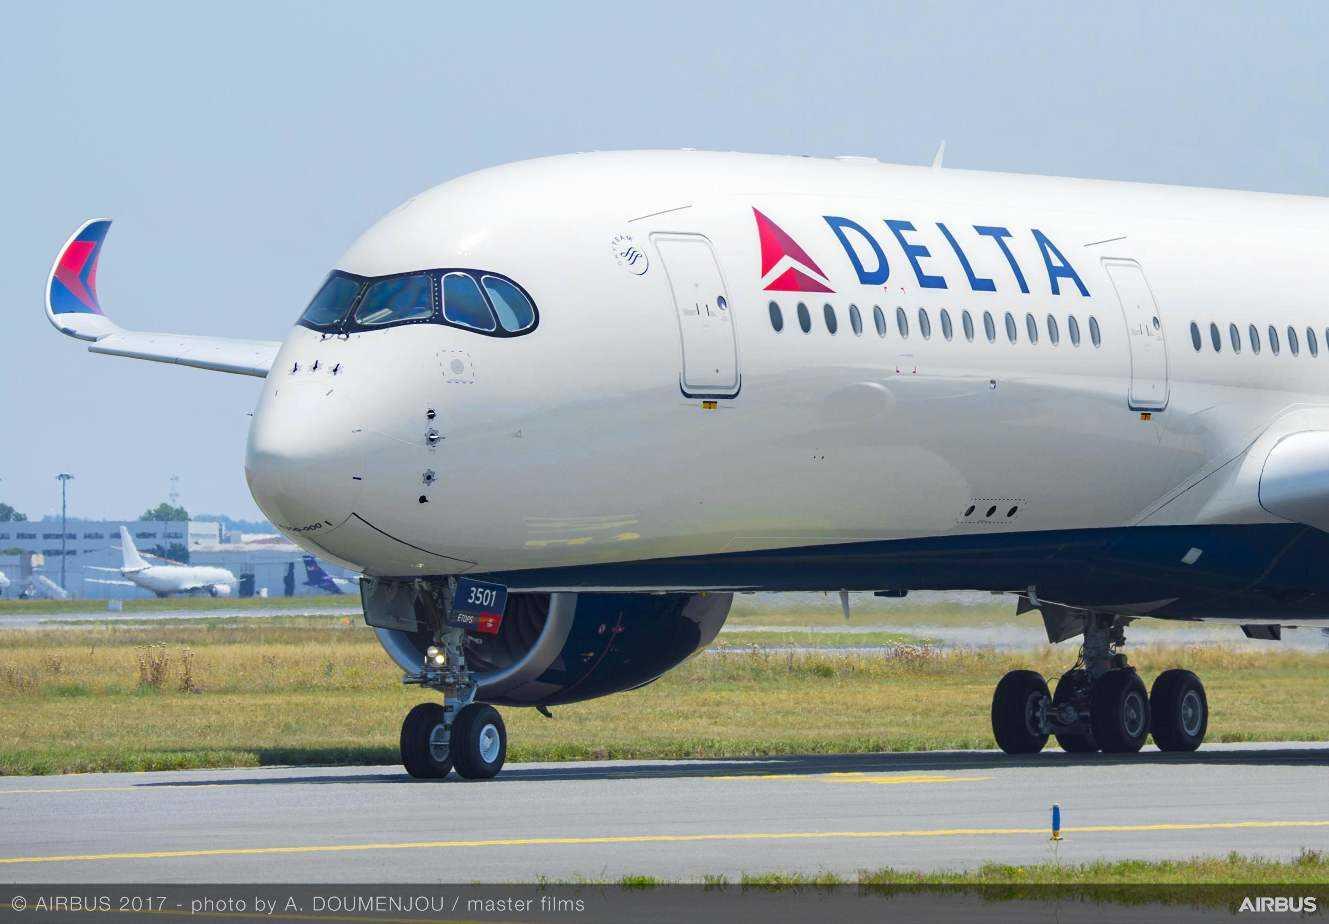 AFI KLM E&M to support Delta A350 fleet